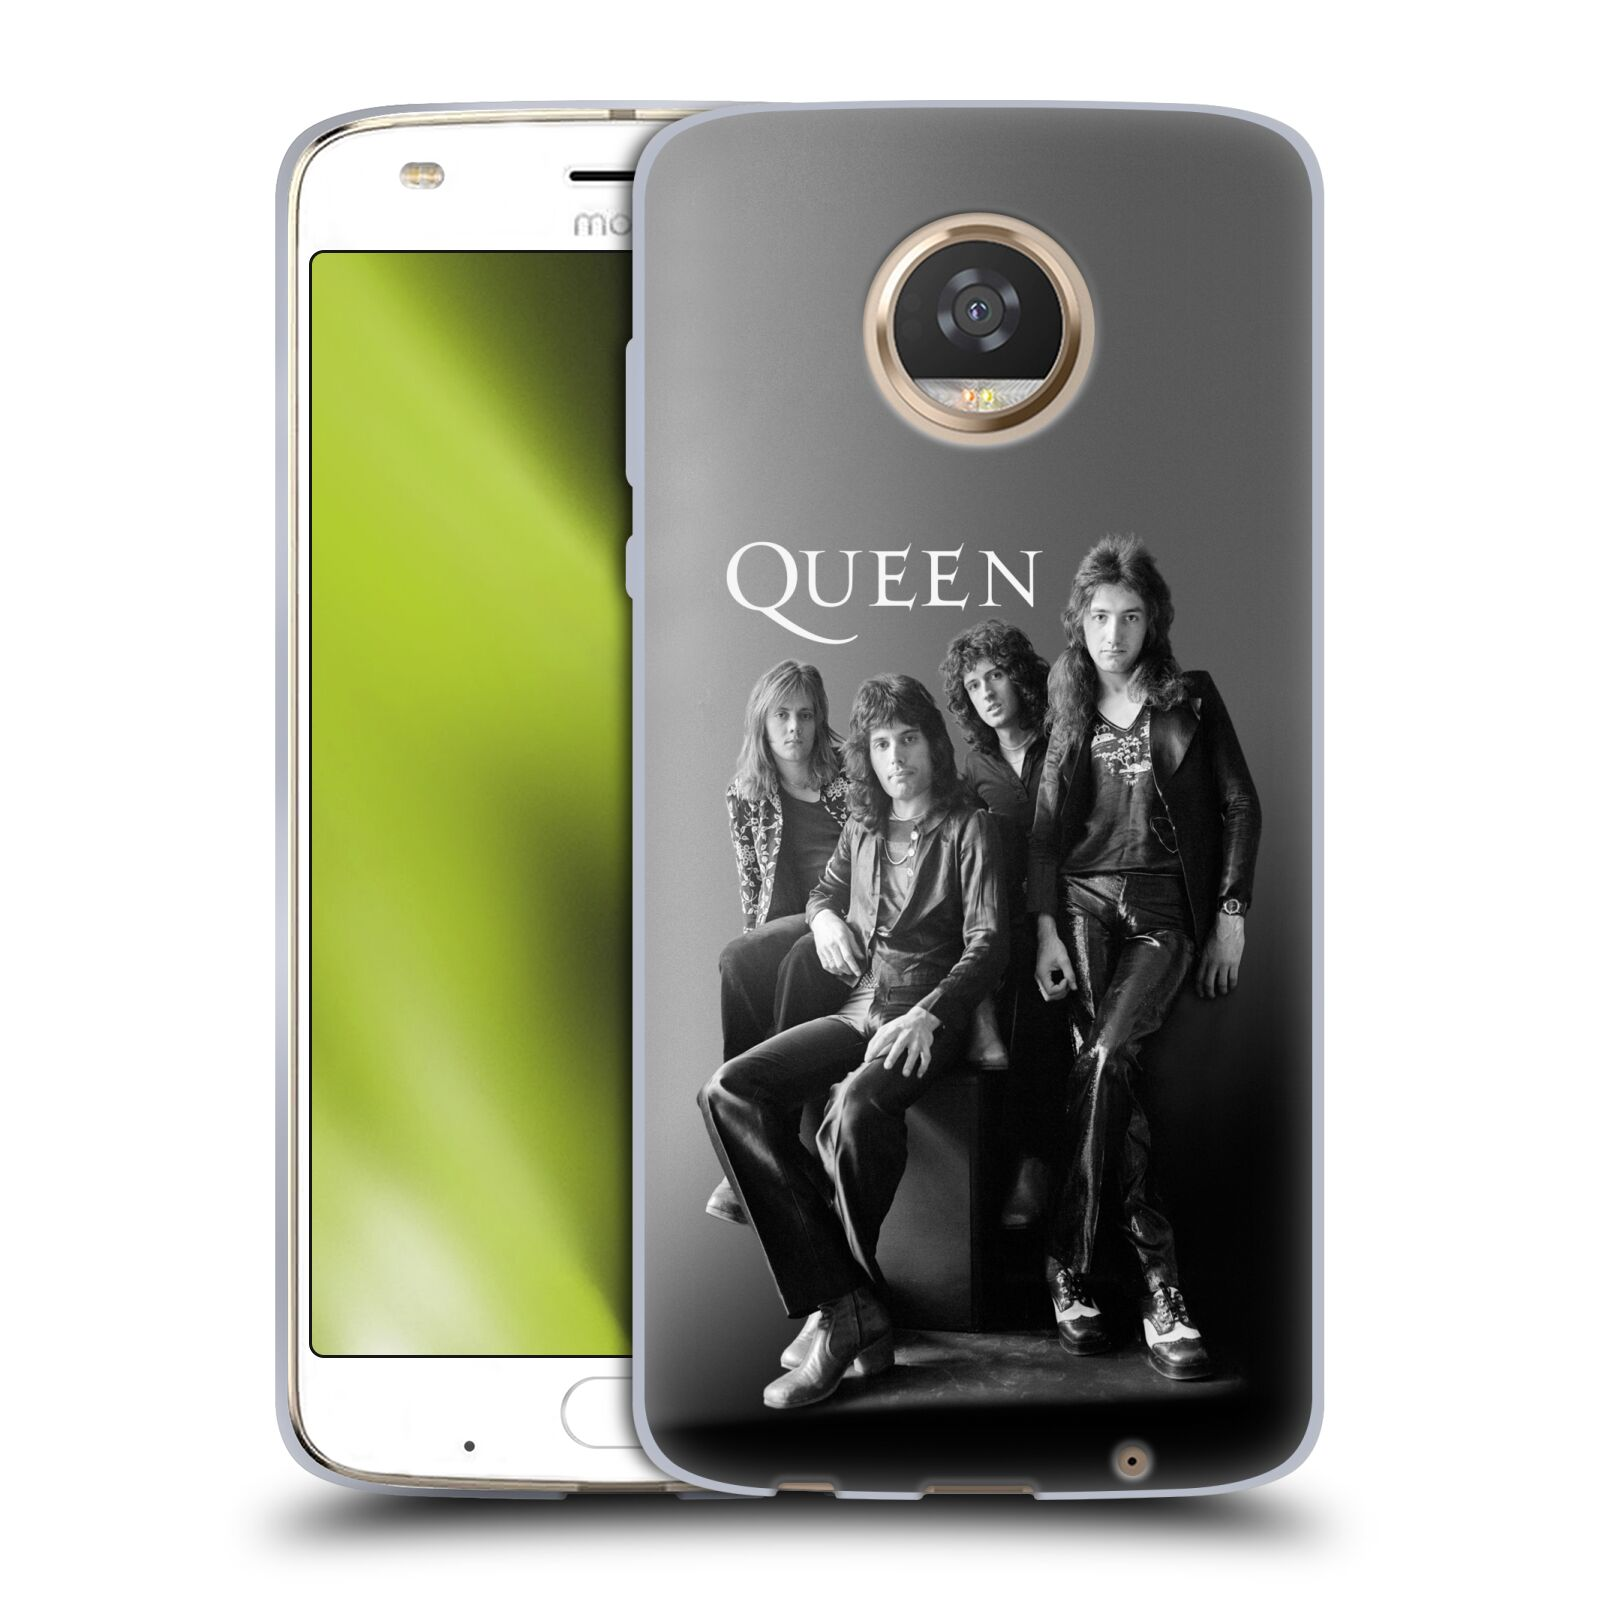 Silikonové pouzdro na mobil Lenovo Moto Z2 Play - Head Case - Queen - Skupina